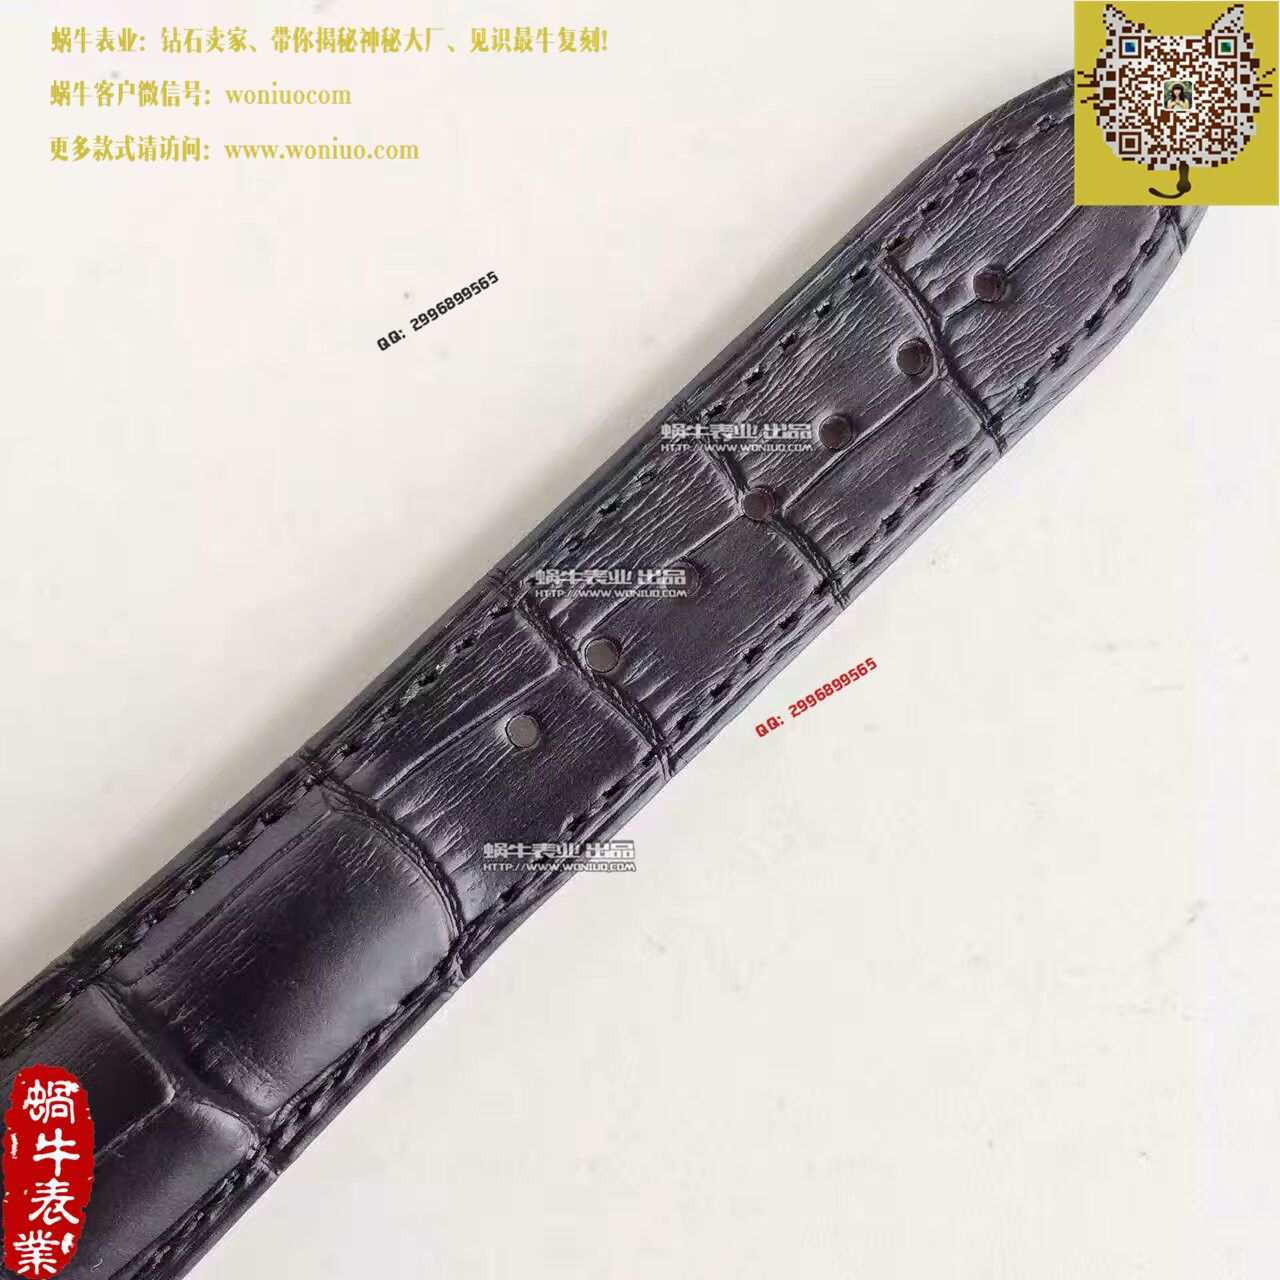 【FM厂一比一复刻手表】法穆兰MEN'S COLLECTION系列8880 B S6 SQT D腕表 / FL09